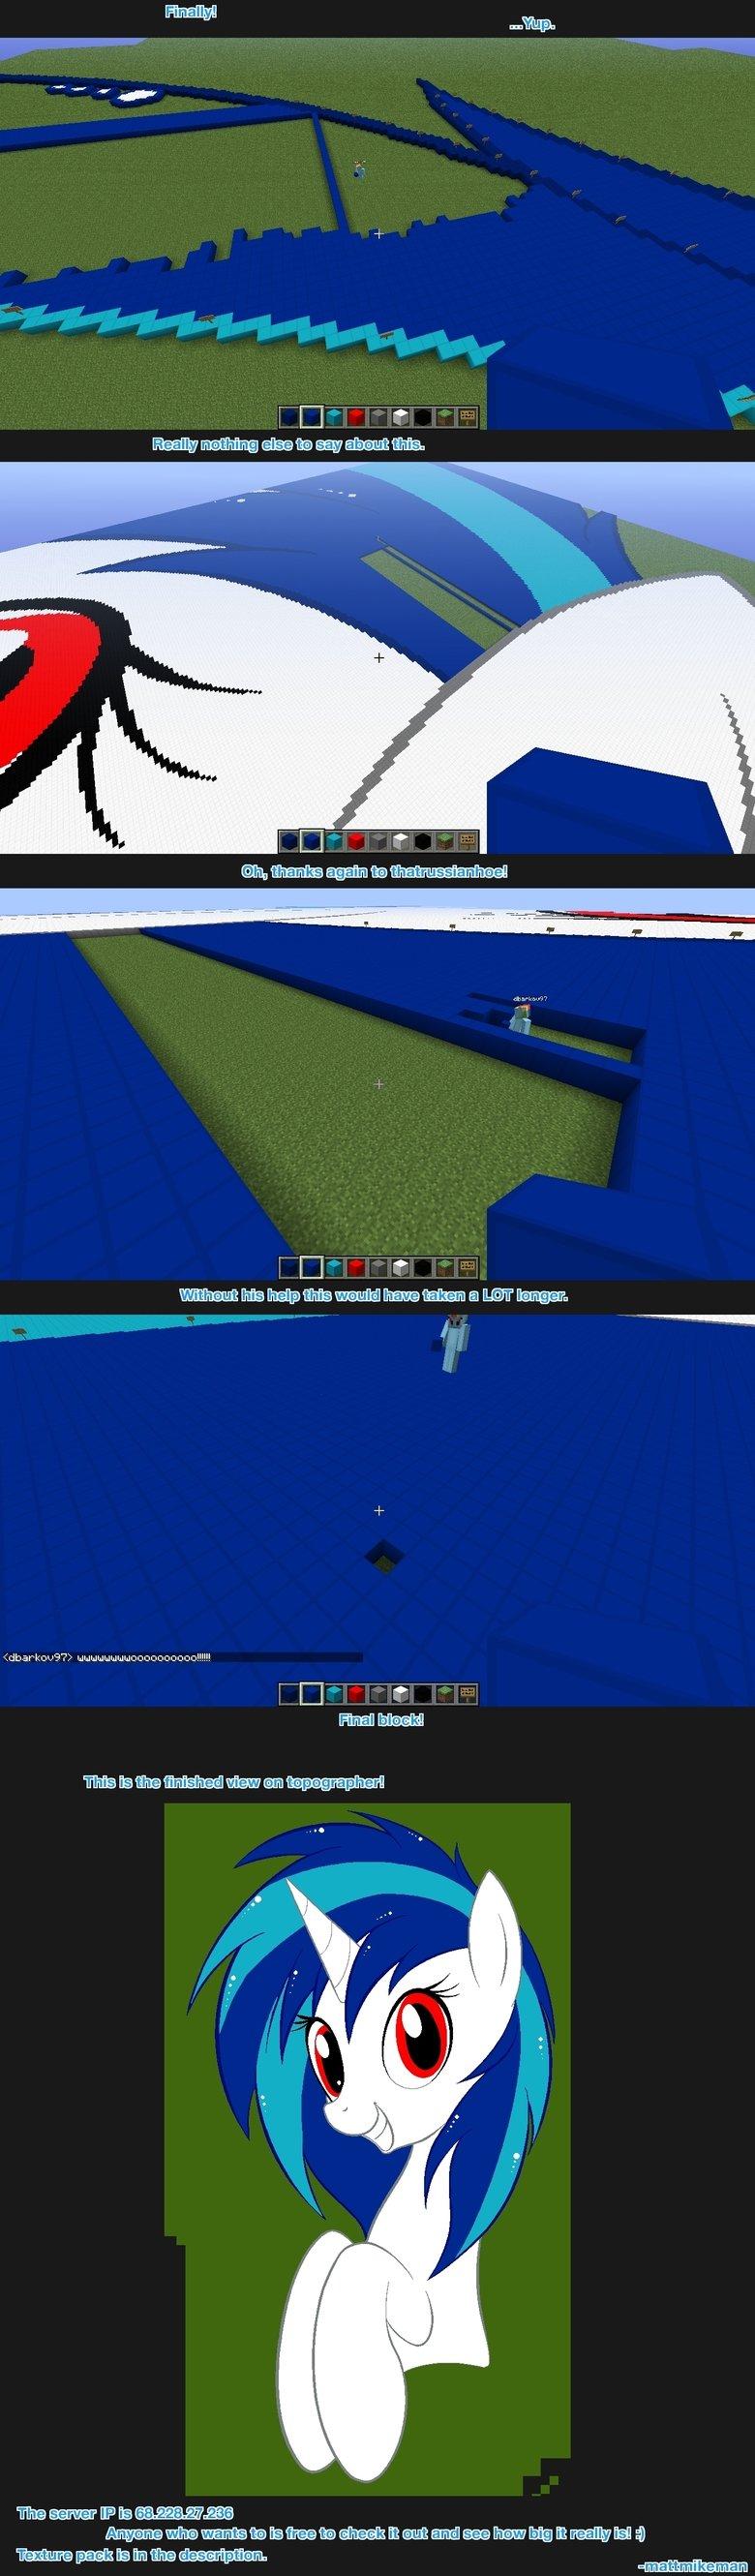 Vinyl Scratch Pixel Art FINAL!. Check out the server! IP: 68.228.27.236 (For easy copy/paste) Texture Pack: www.dropbox.com/s/2tddcugjiv3nyem/Pix... Just drop t Vinyl scratch Minecraft pixel art